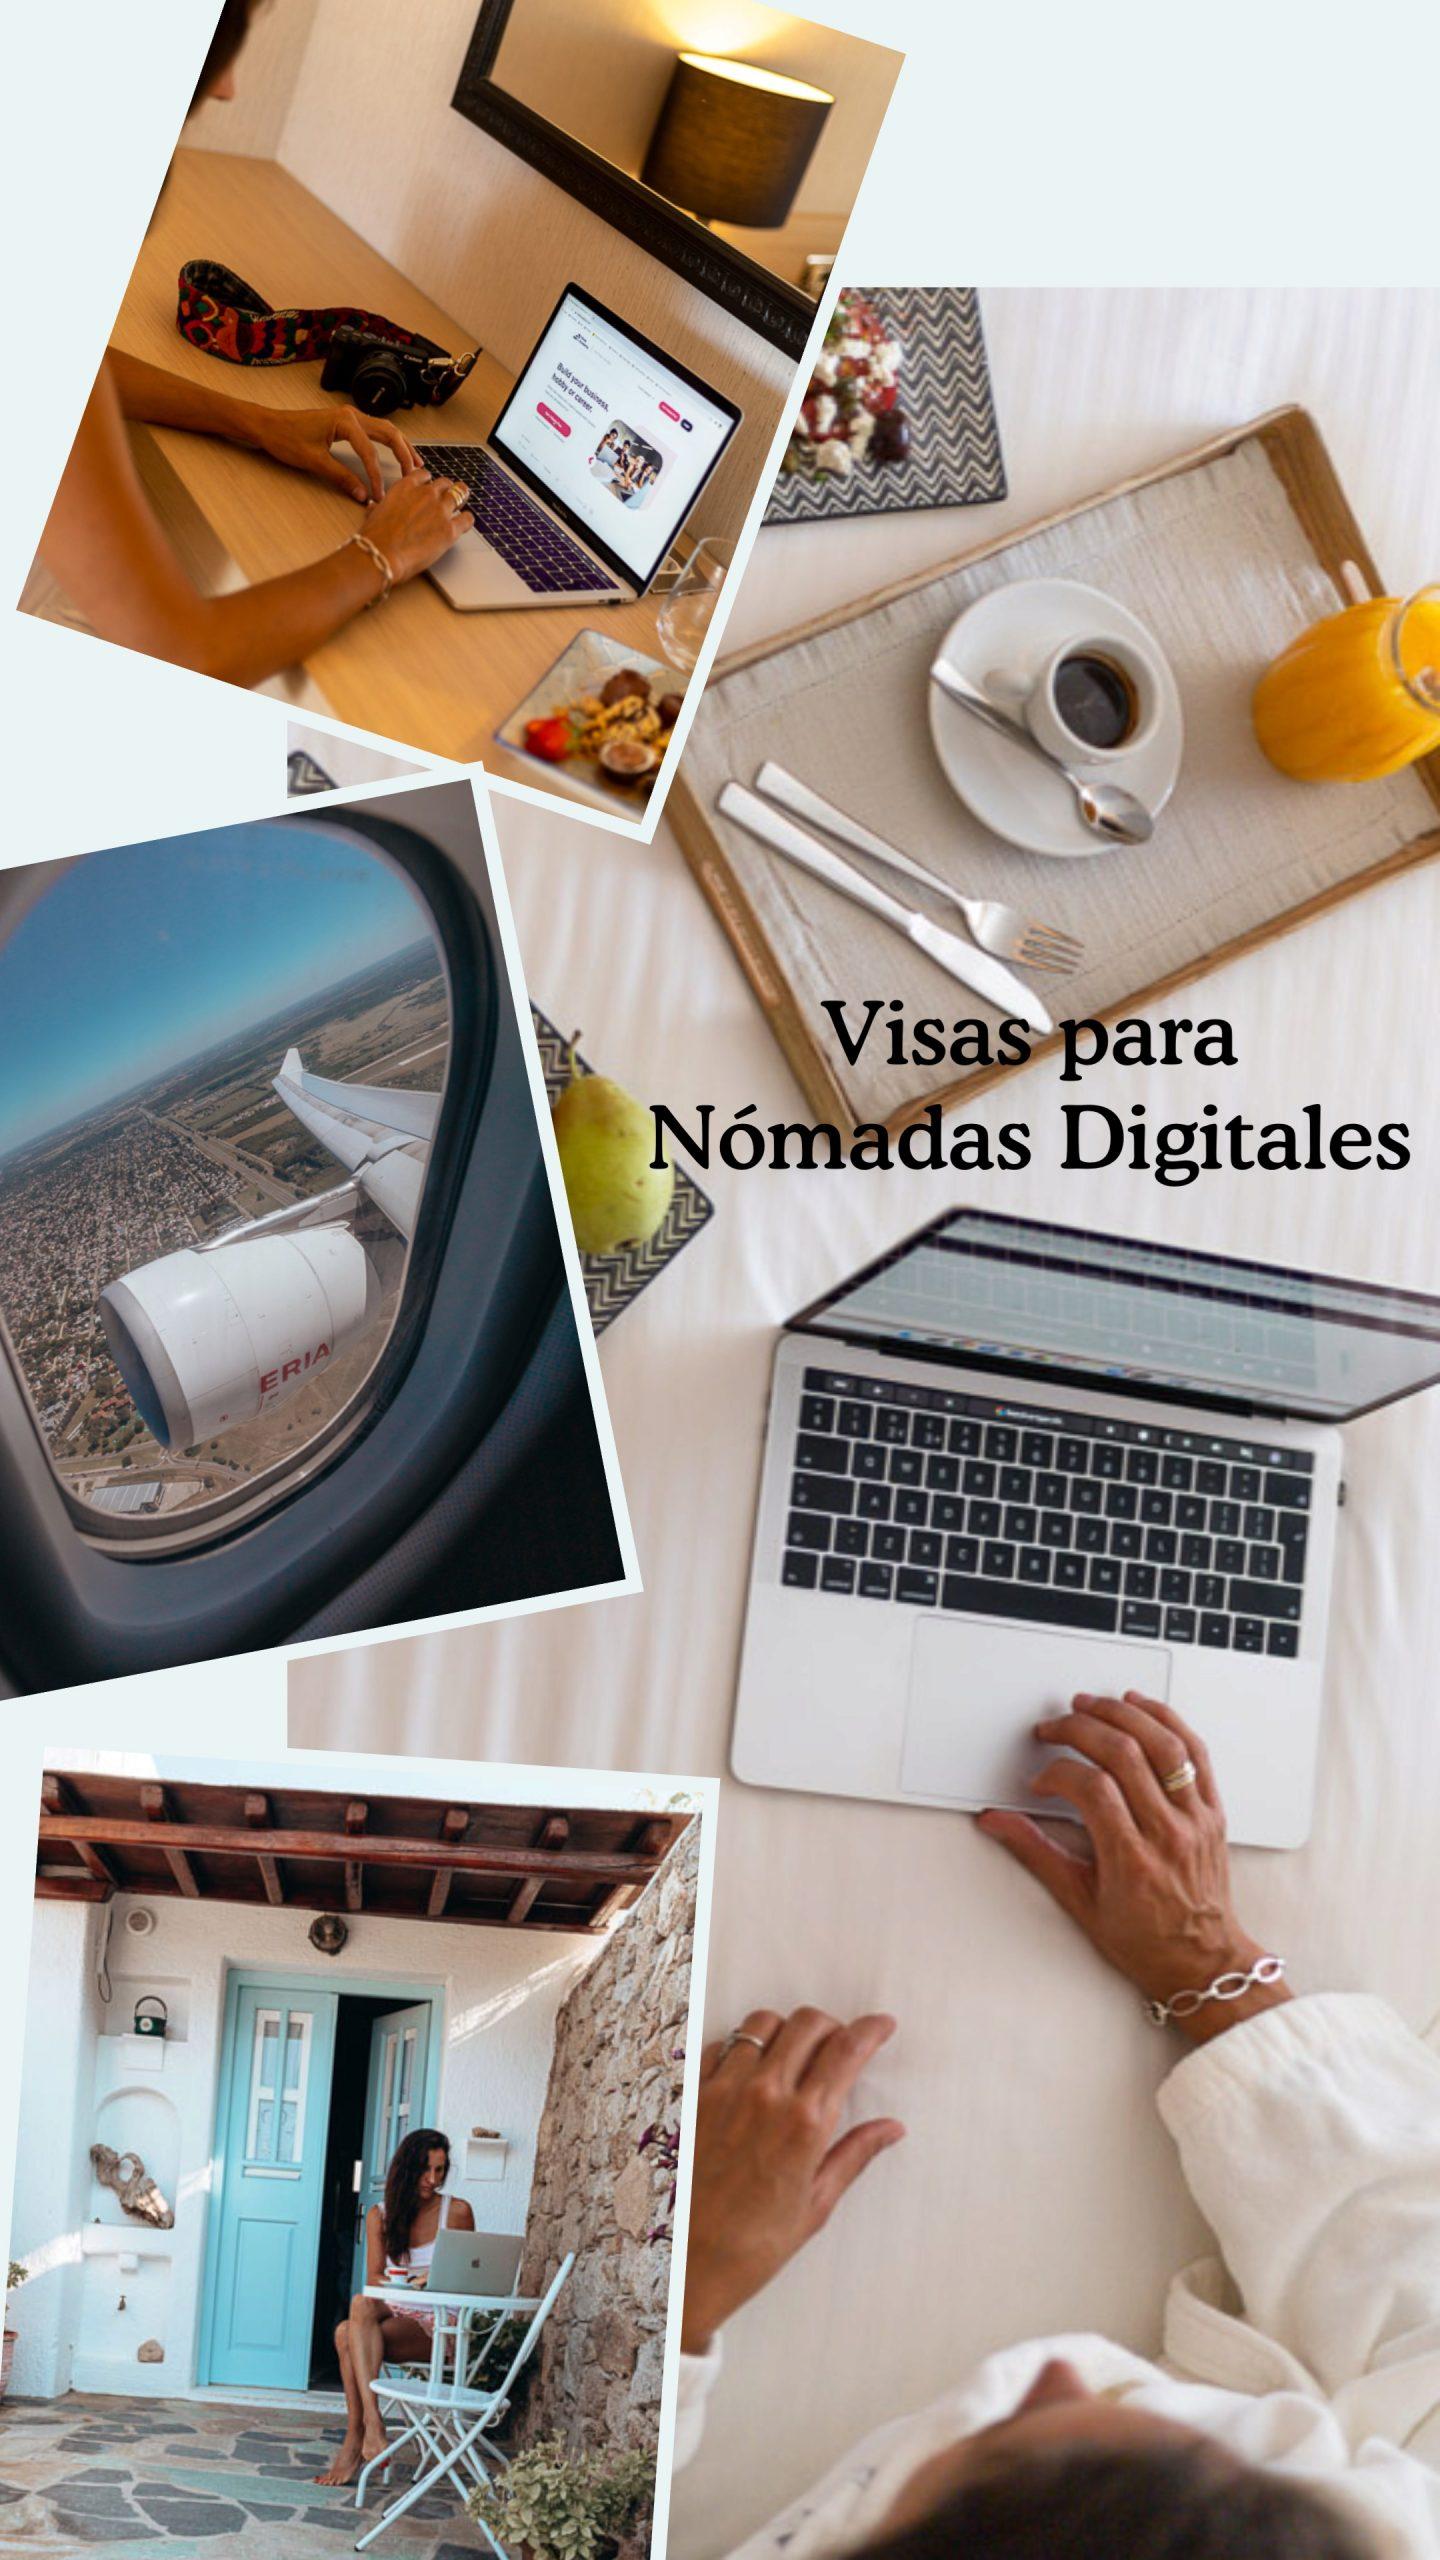 Visas para Nómades Digitales